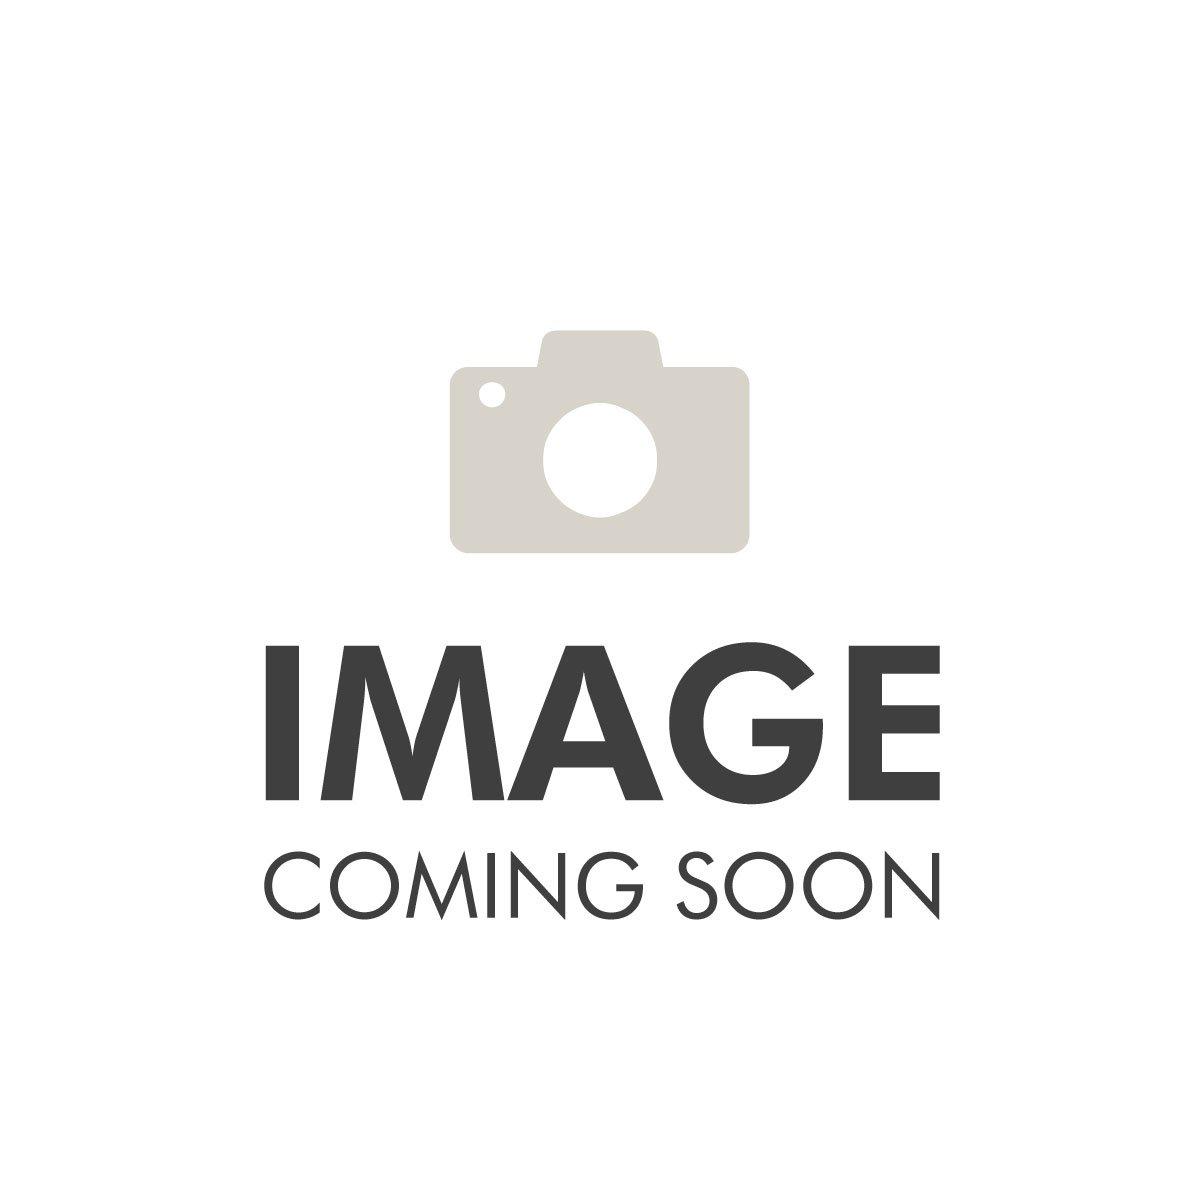 L'Oreal MEN EXPERT HYDRA ENERGETIC KIT - FACE WASH & SHAVING FOAM